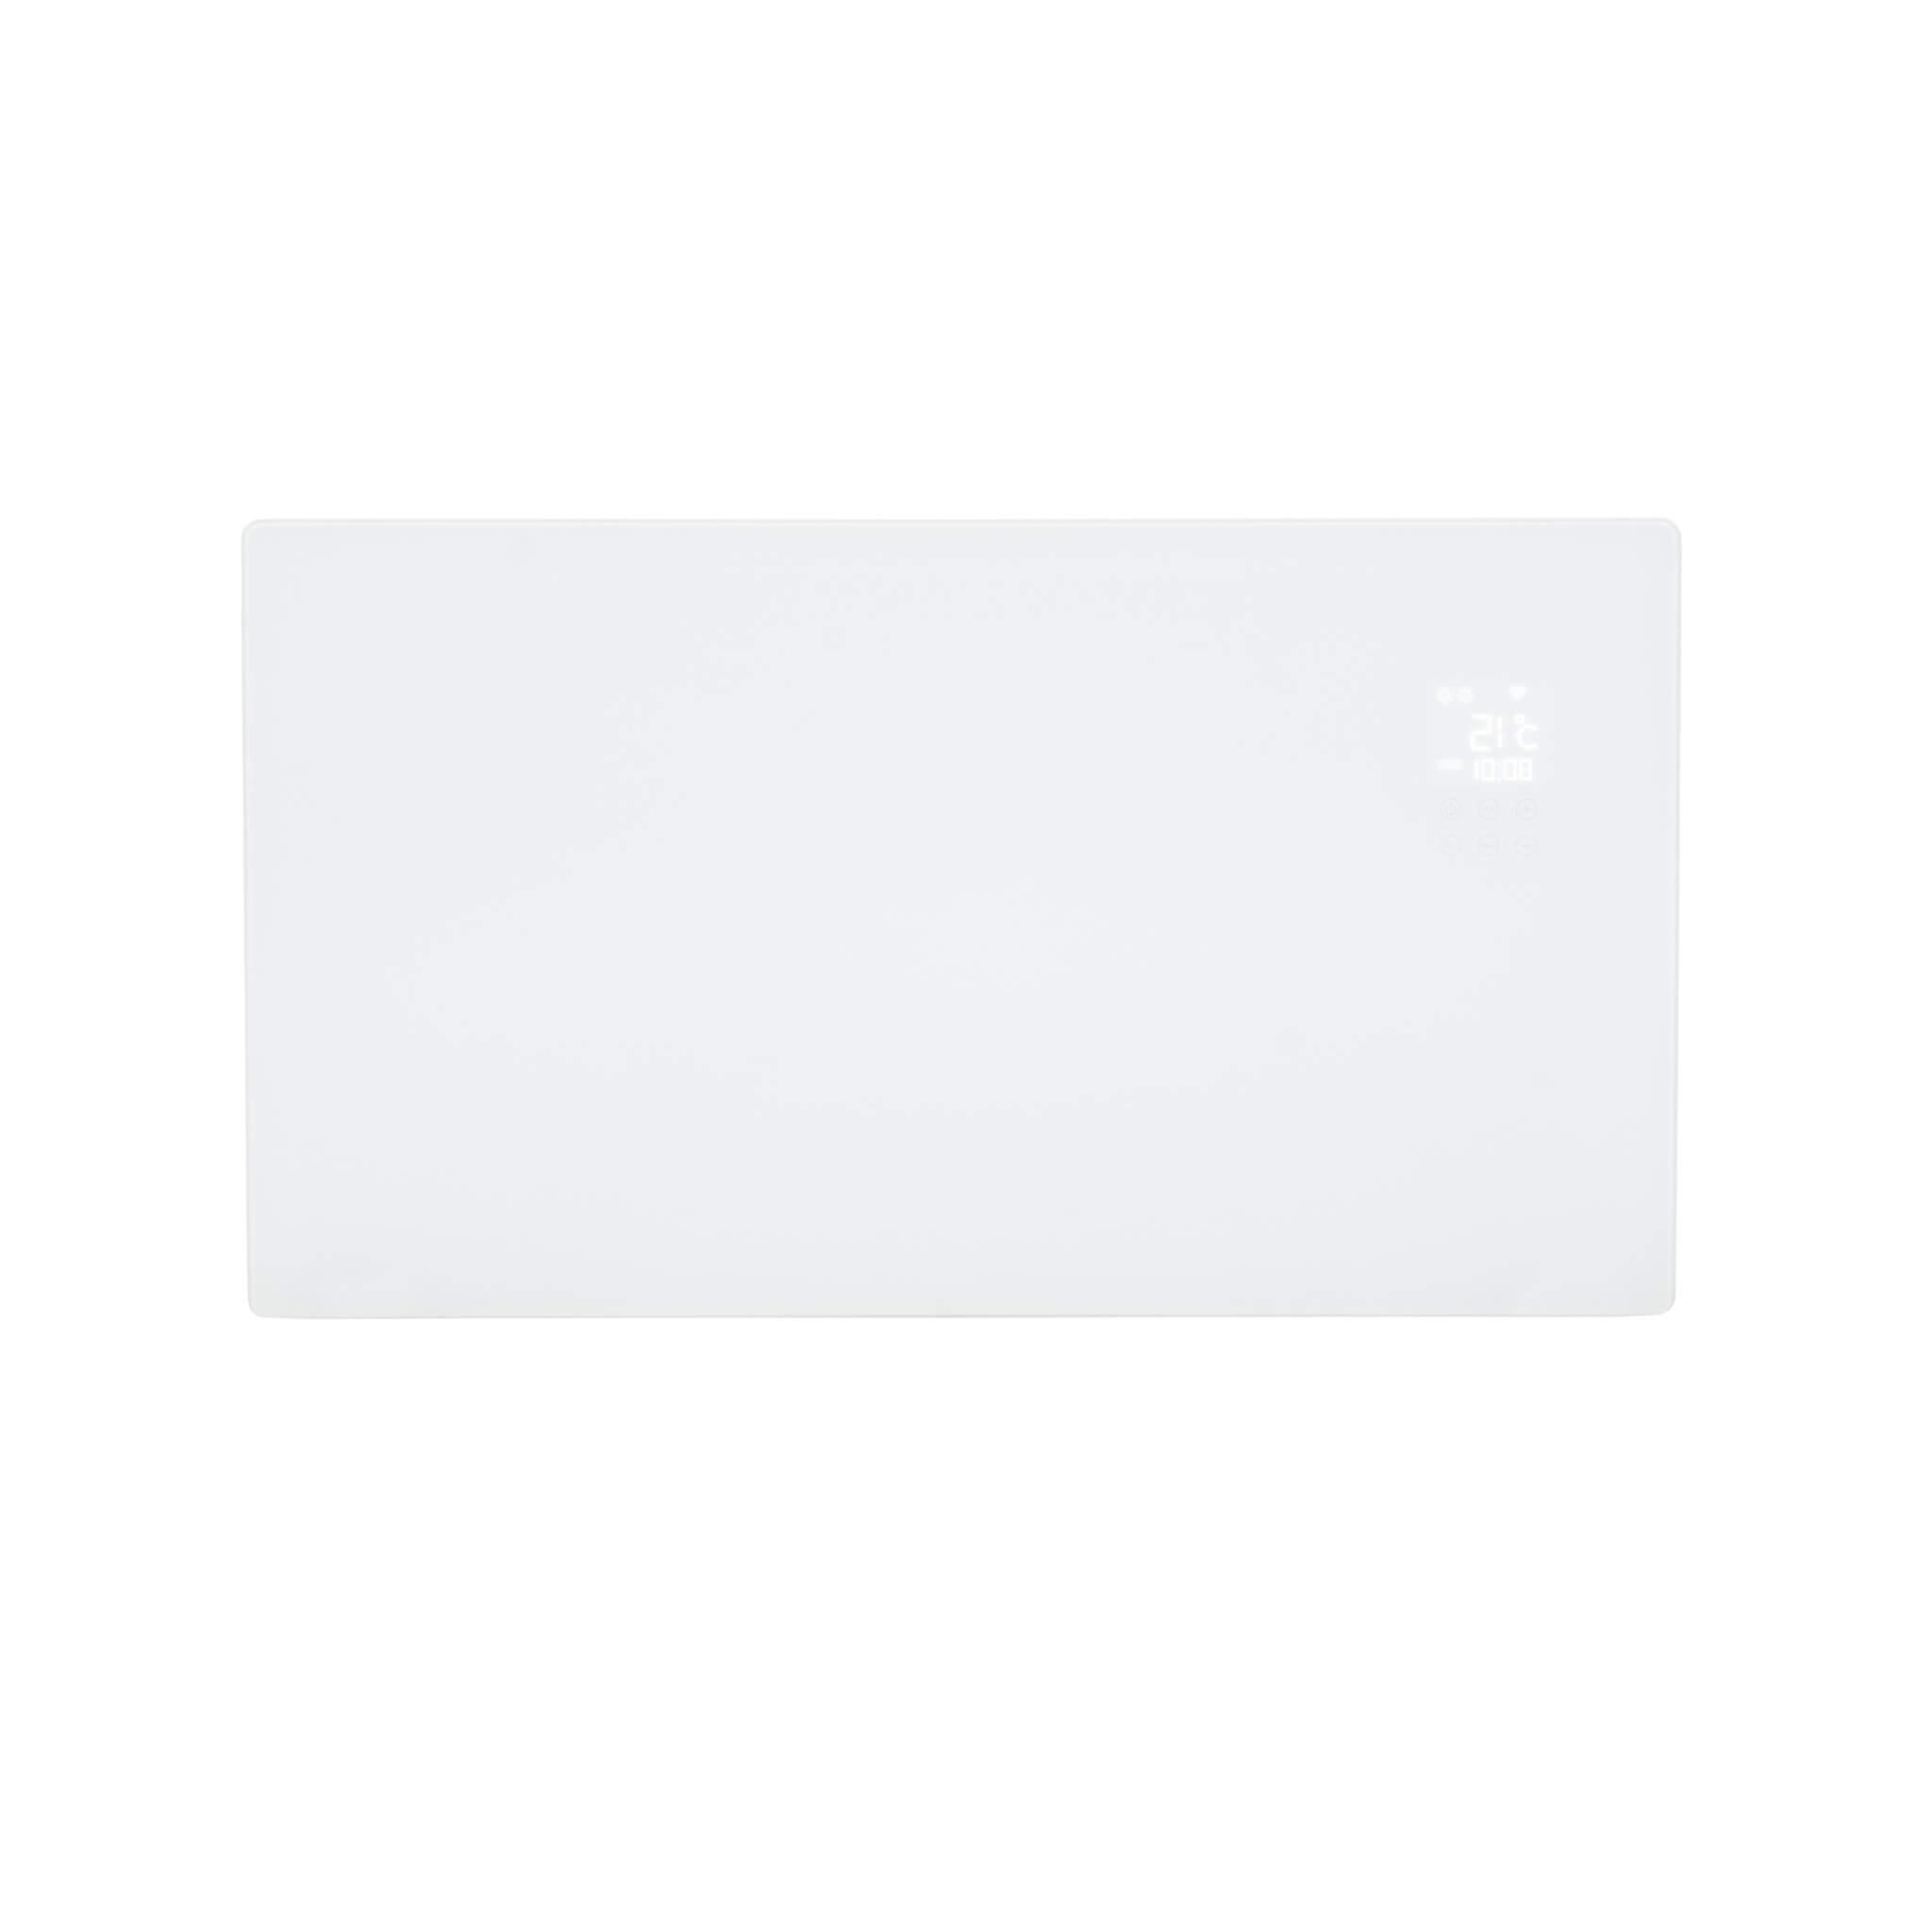 Eurom Alutherm Verre 1500 WiFi Convectorkachel | Moderne Kachel met LED Display